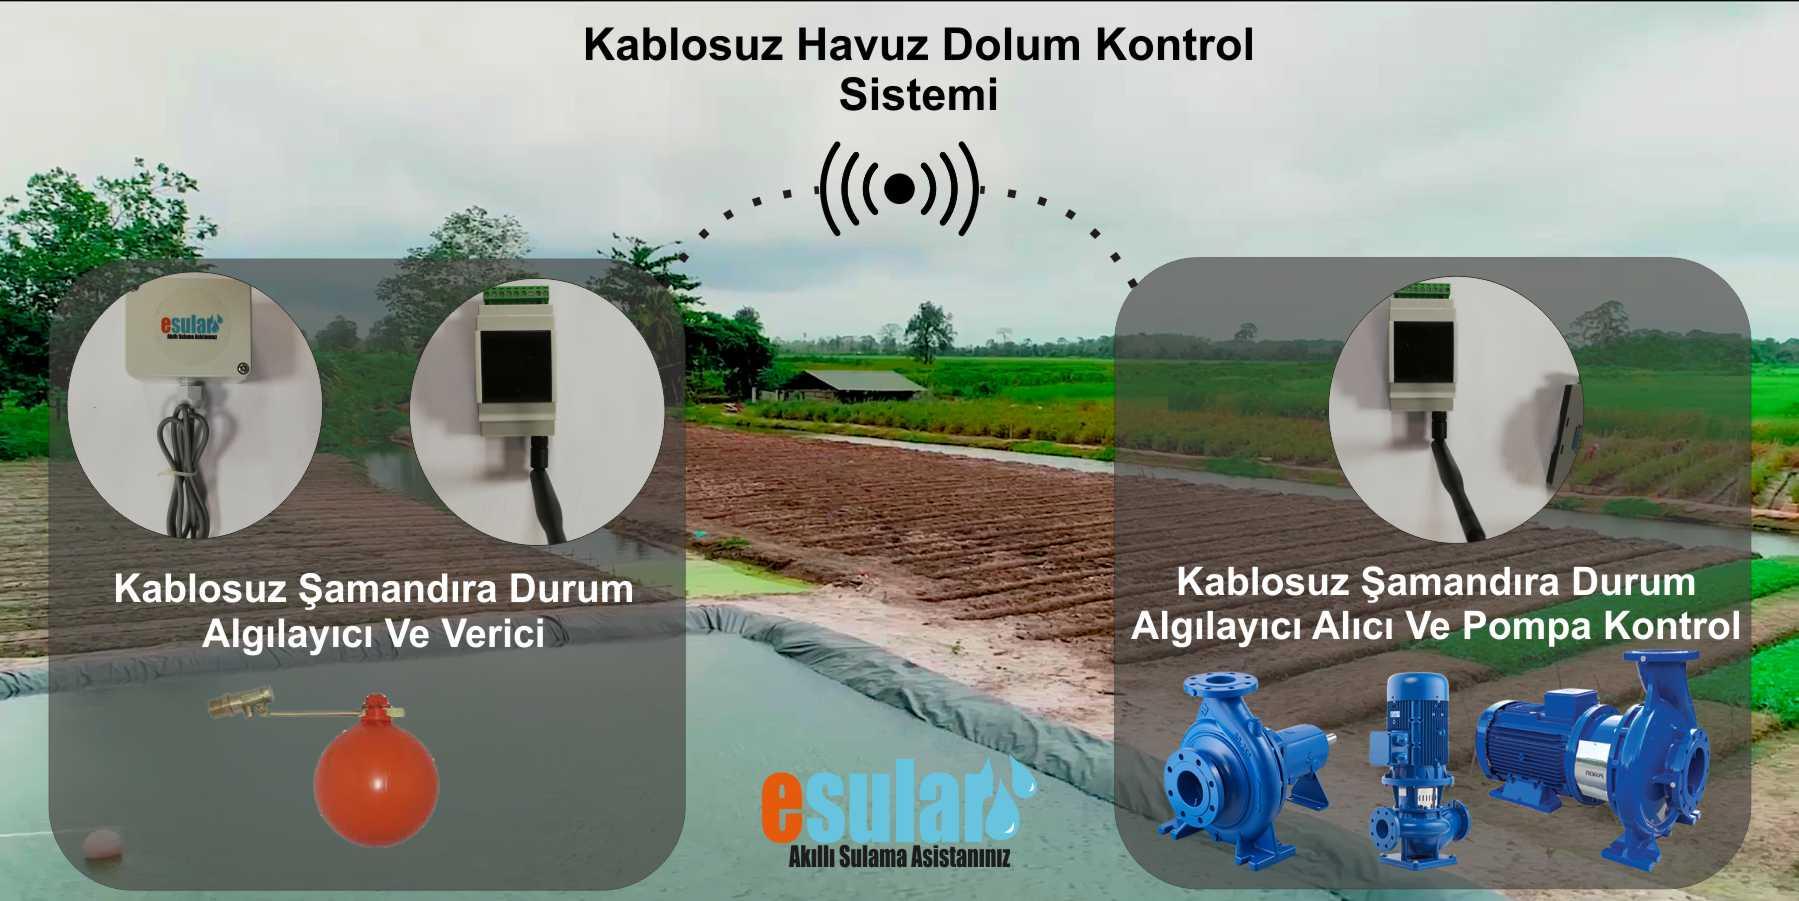 Kablosuz Havuz Doldurma Kontrol Sistemi